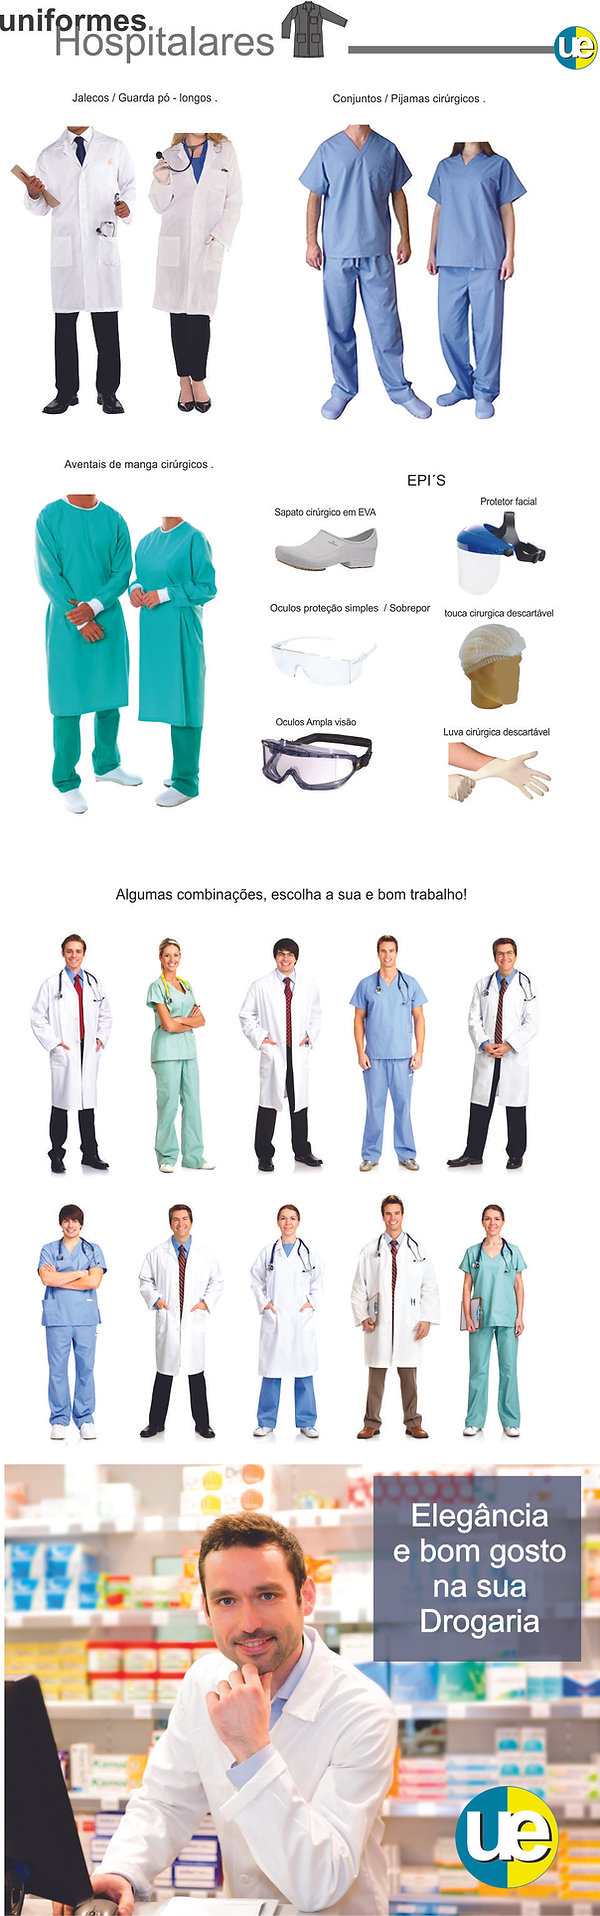 uniformes hospitalares - pagina.jpg